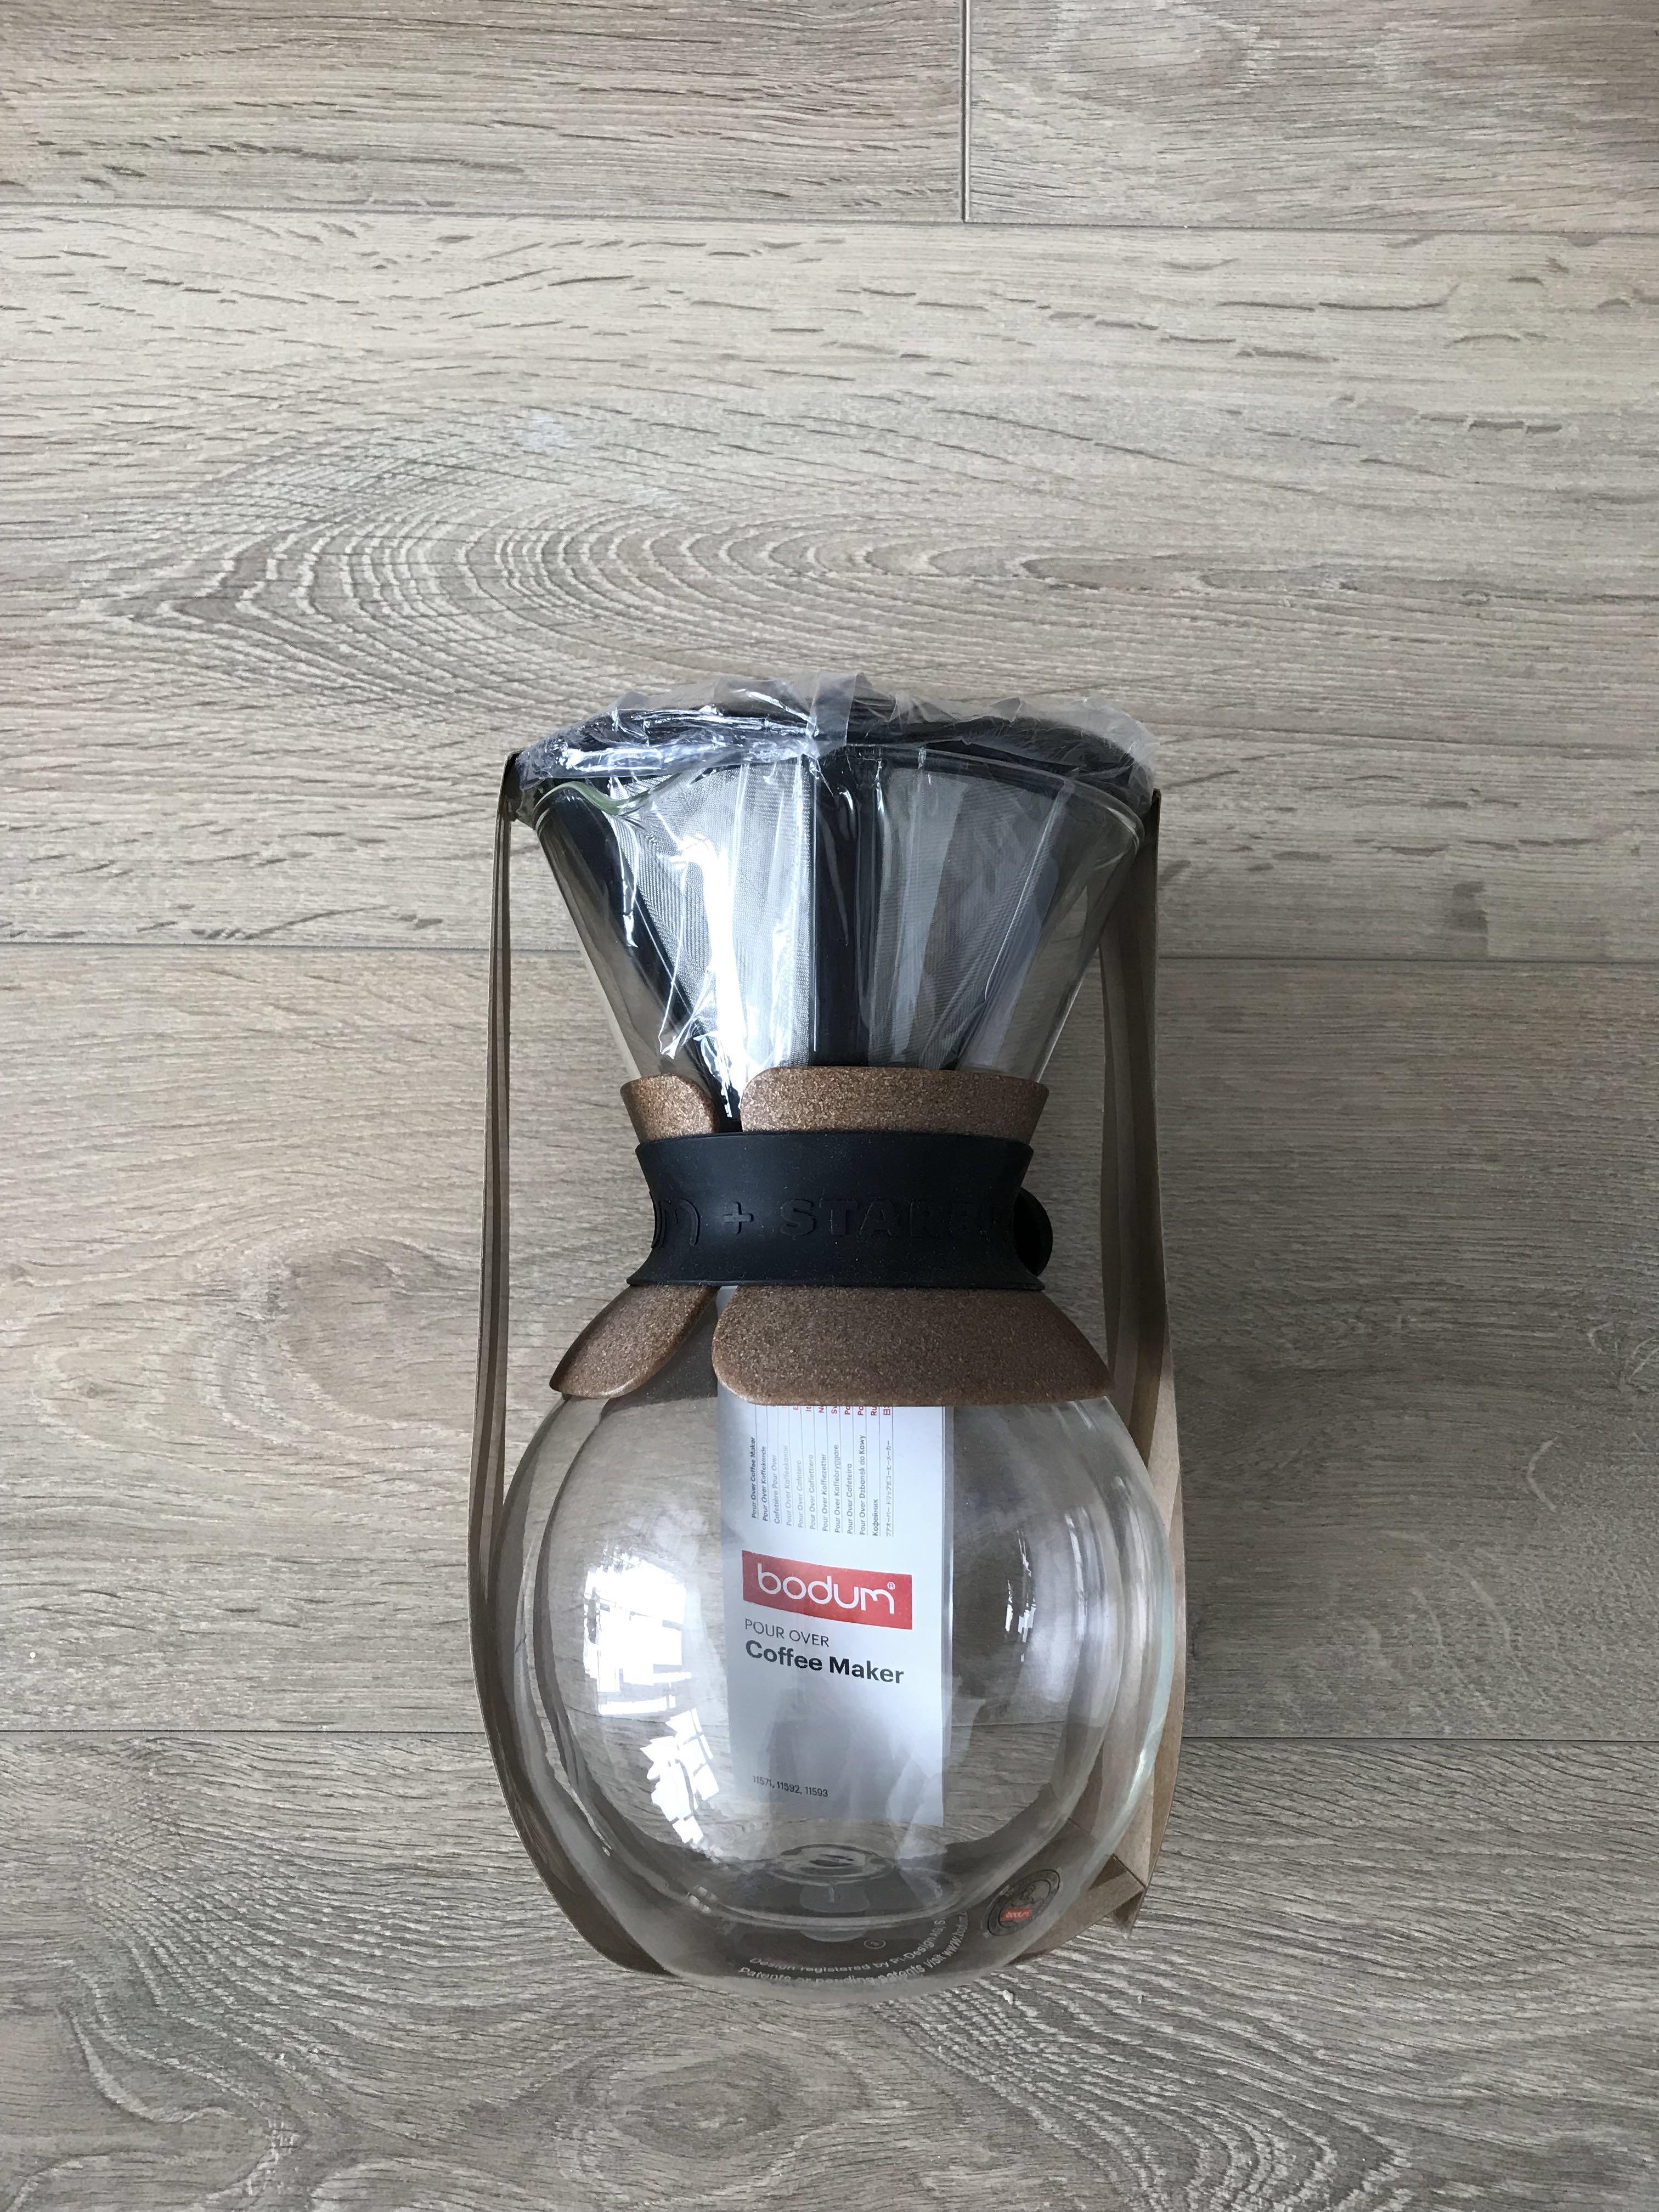 Bodum x Starbucks 5-Cup Pour Over Coffee Maker